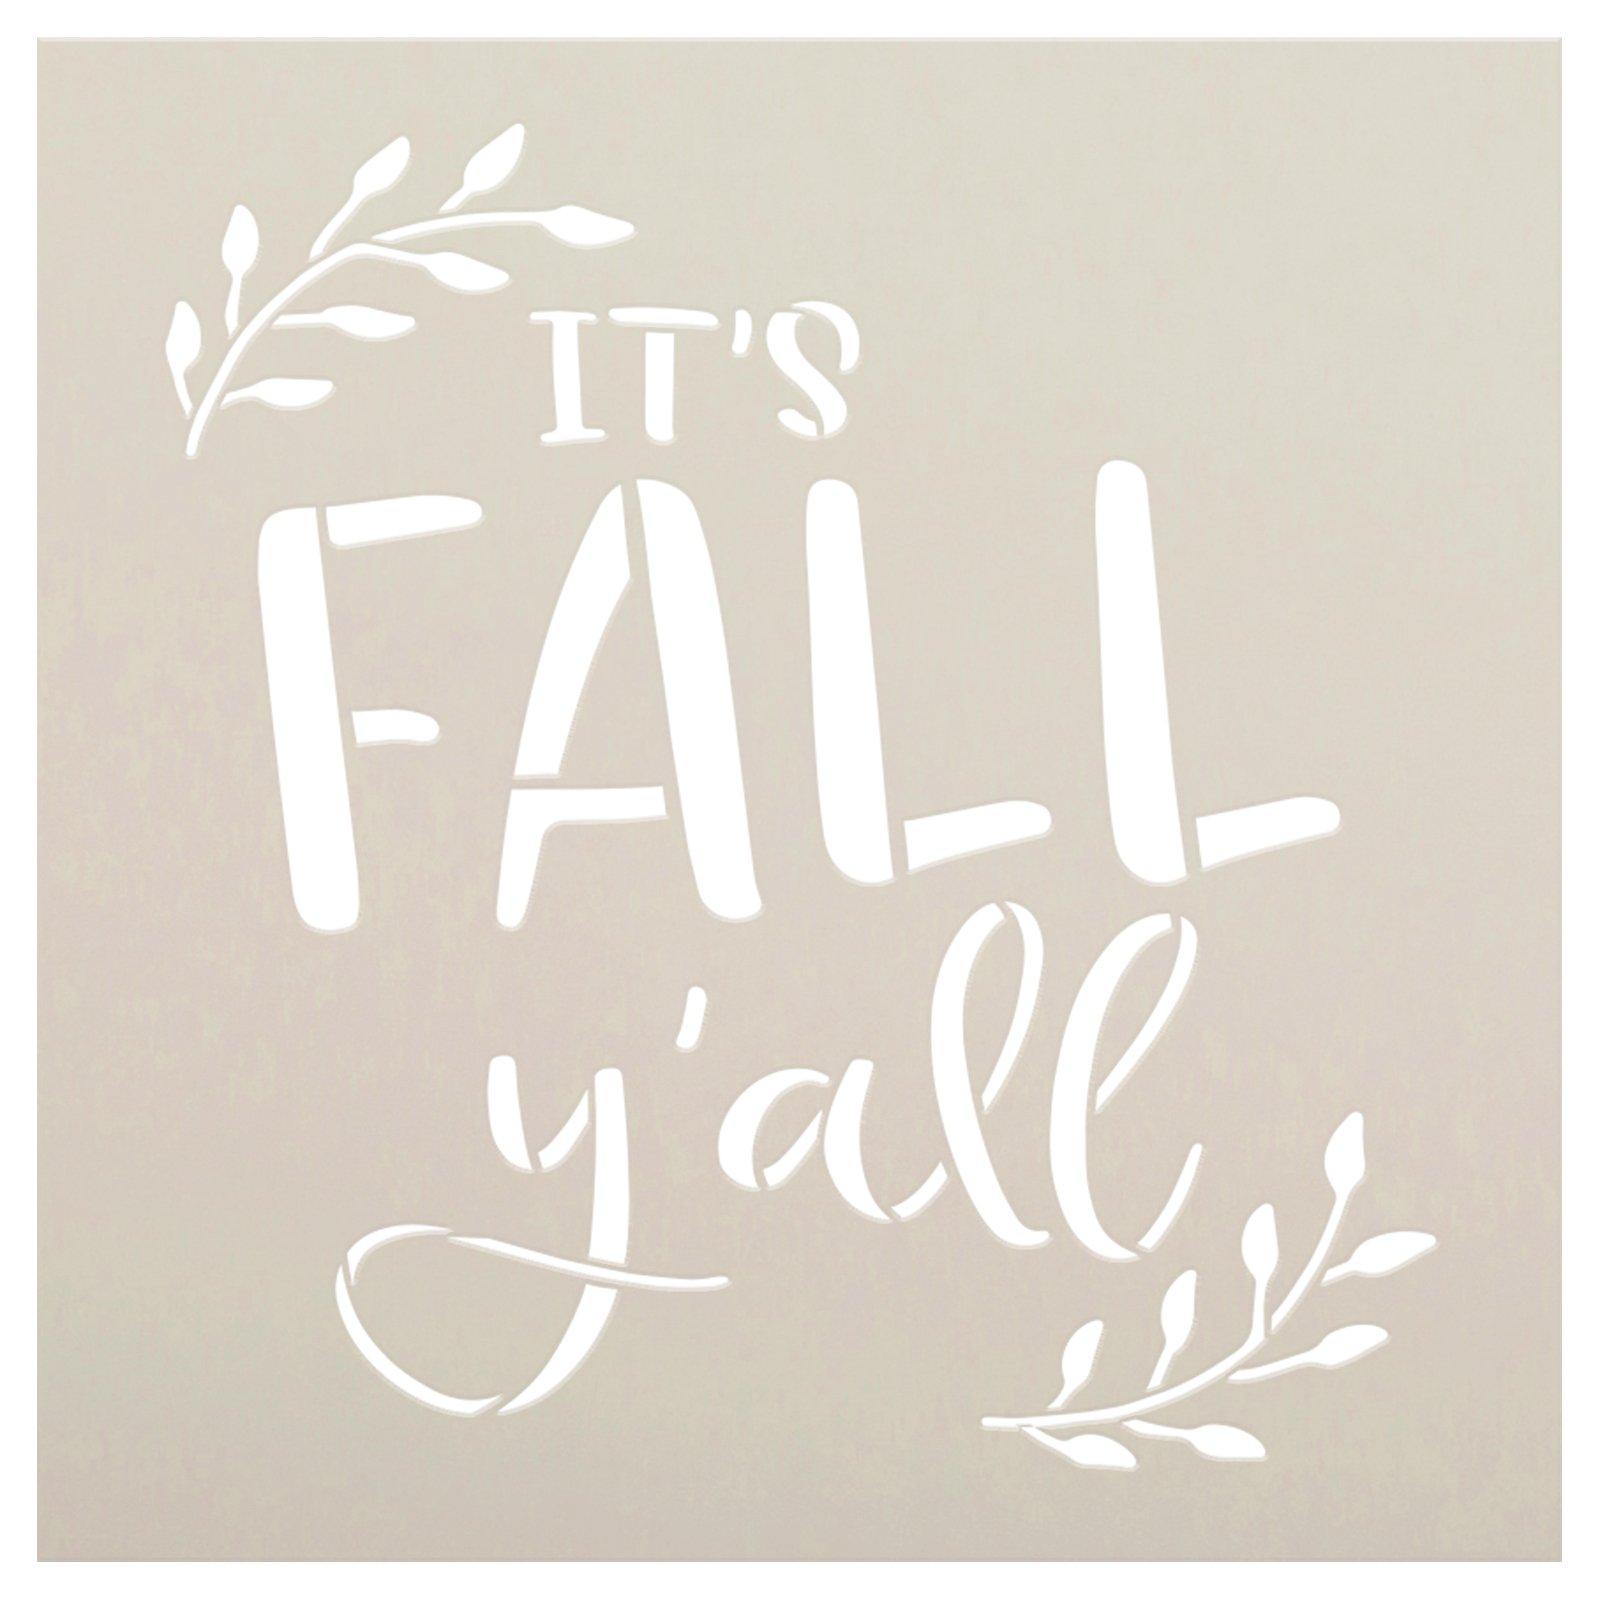 It's Fall Y'all Stencil by StudioR12 | DIY Laurel Home Decor | Craft & Paint Autumn Cursive Script Wood Sign | Reusable Mylar Template | Select Size